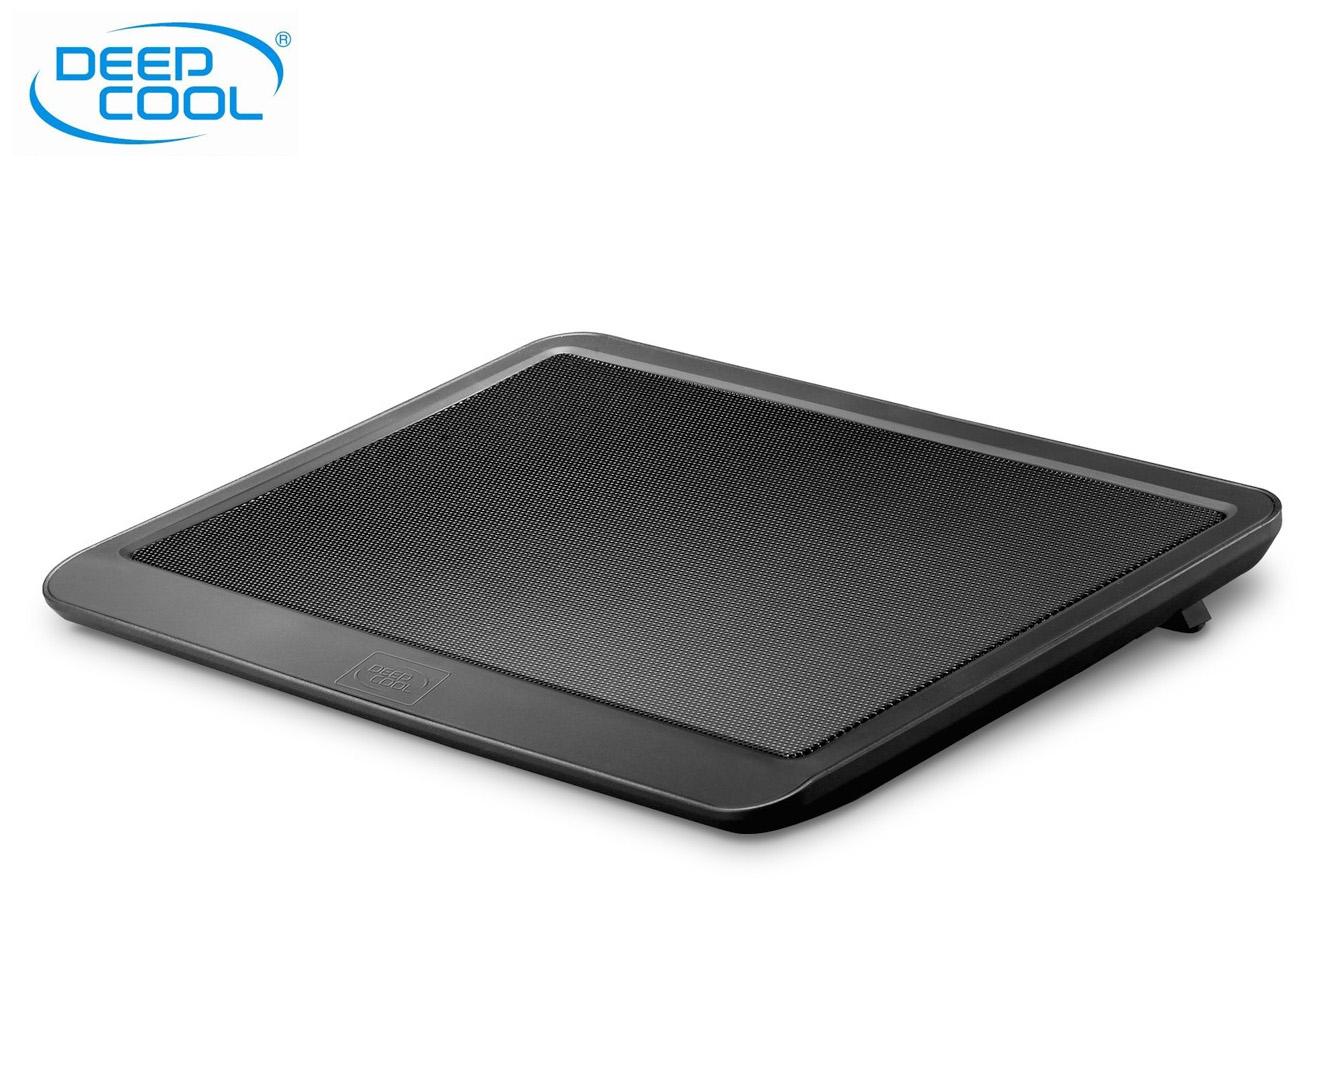 Deepcool N19 Superslim Notebook Cooler Great Daily Deals